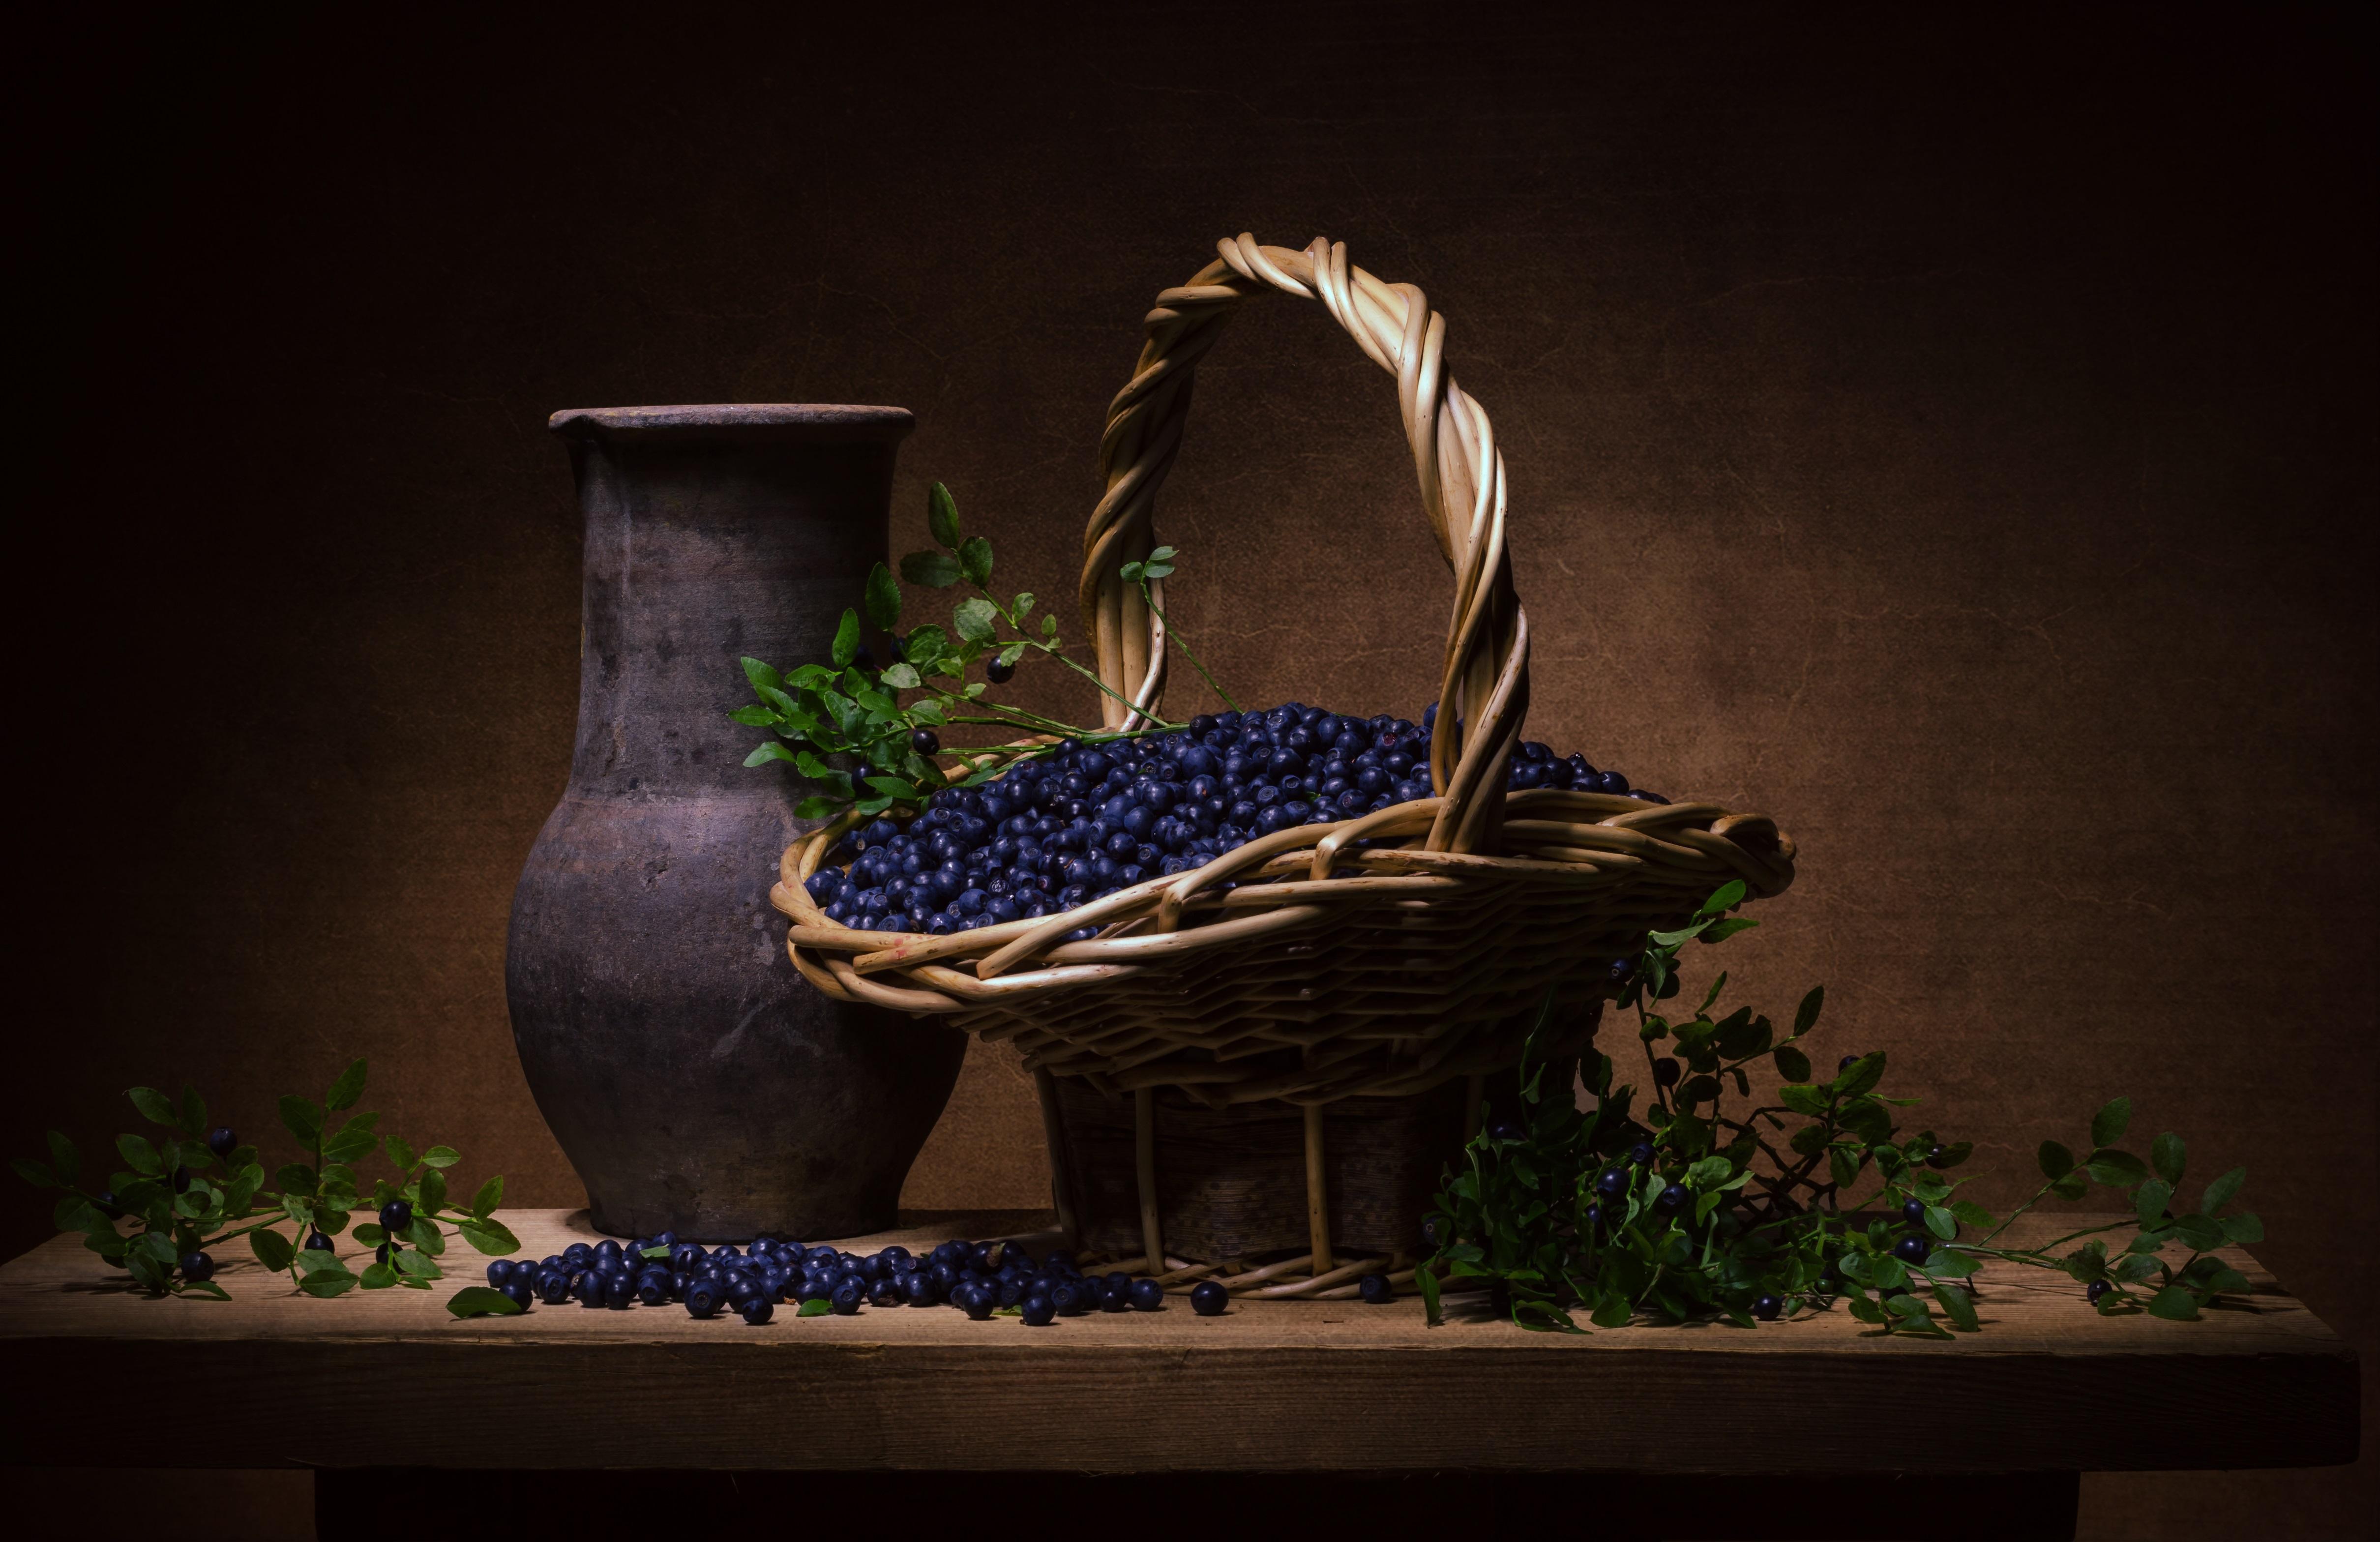 Basket Berry Blueberry Fruit Still Life Vase 4840x3136